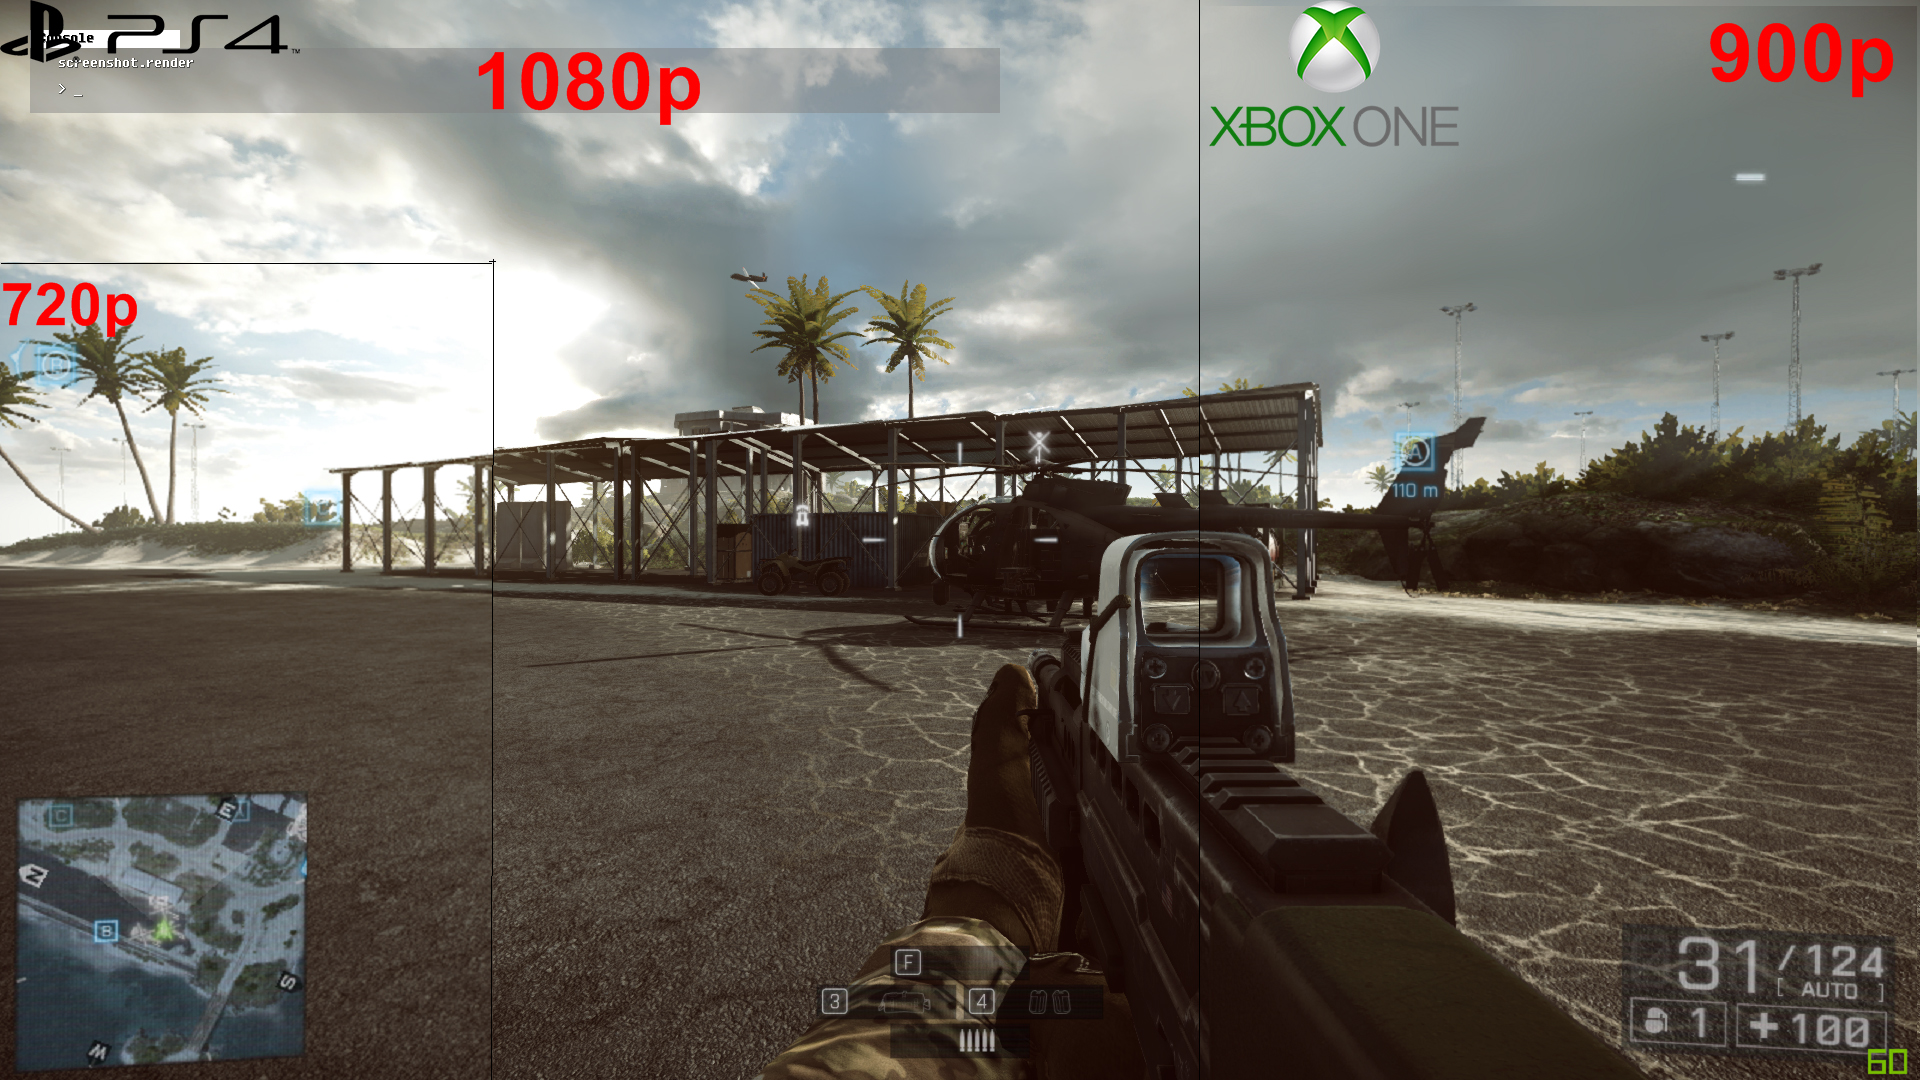 ps4 1080p